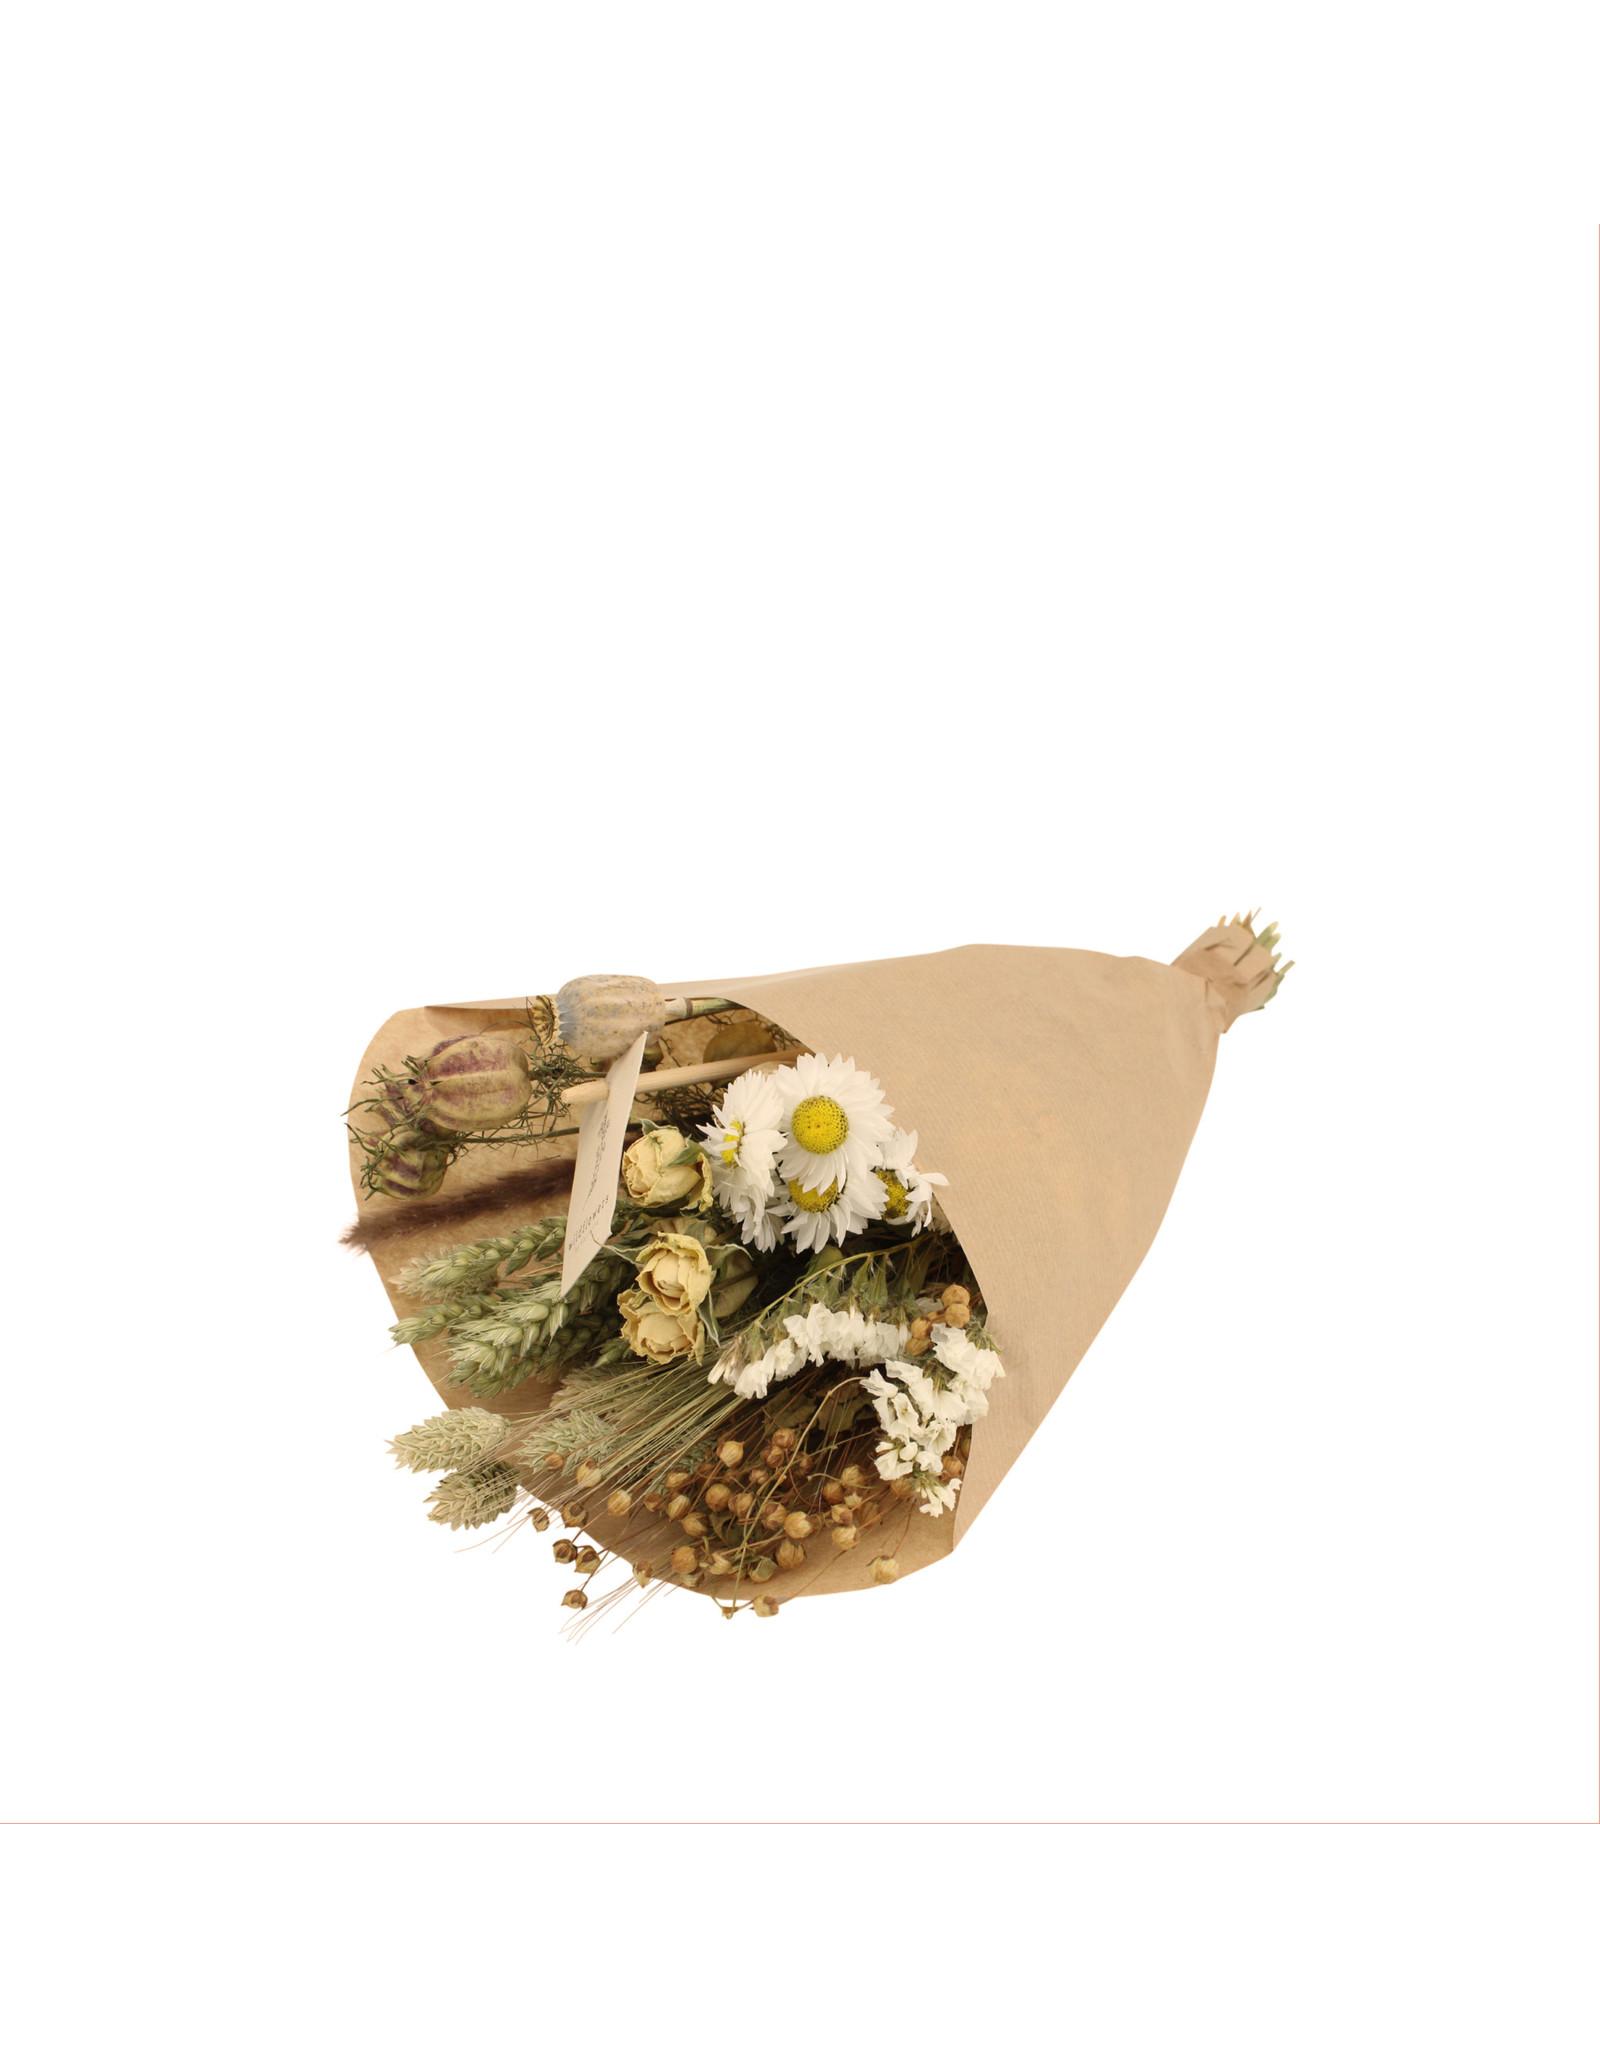 Wildflowers by floriette Boeket droogbloemen Small  - Naturel - Veldbloemen - 35 x 12 cm